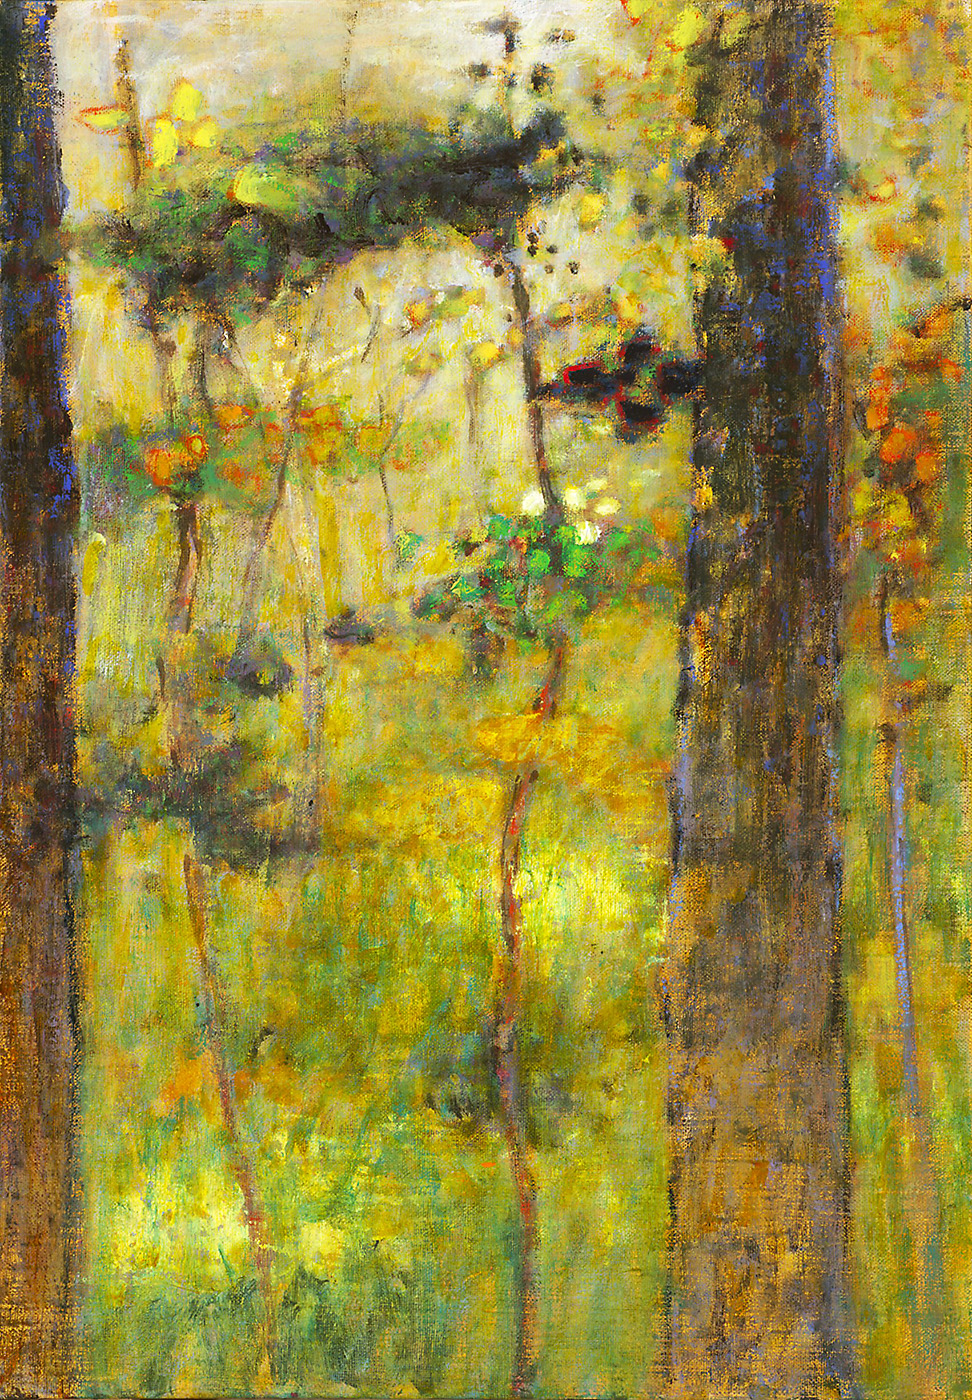 "Act Of Light   | oil on linen | 20 x 14"" | 2014"